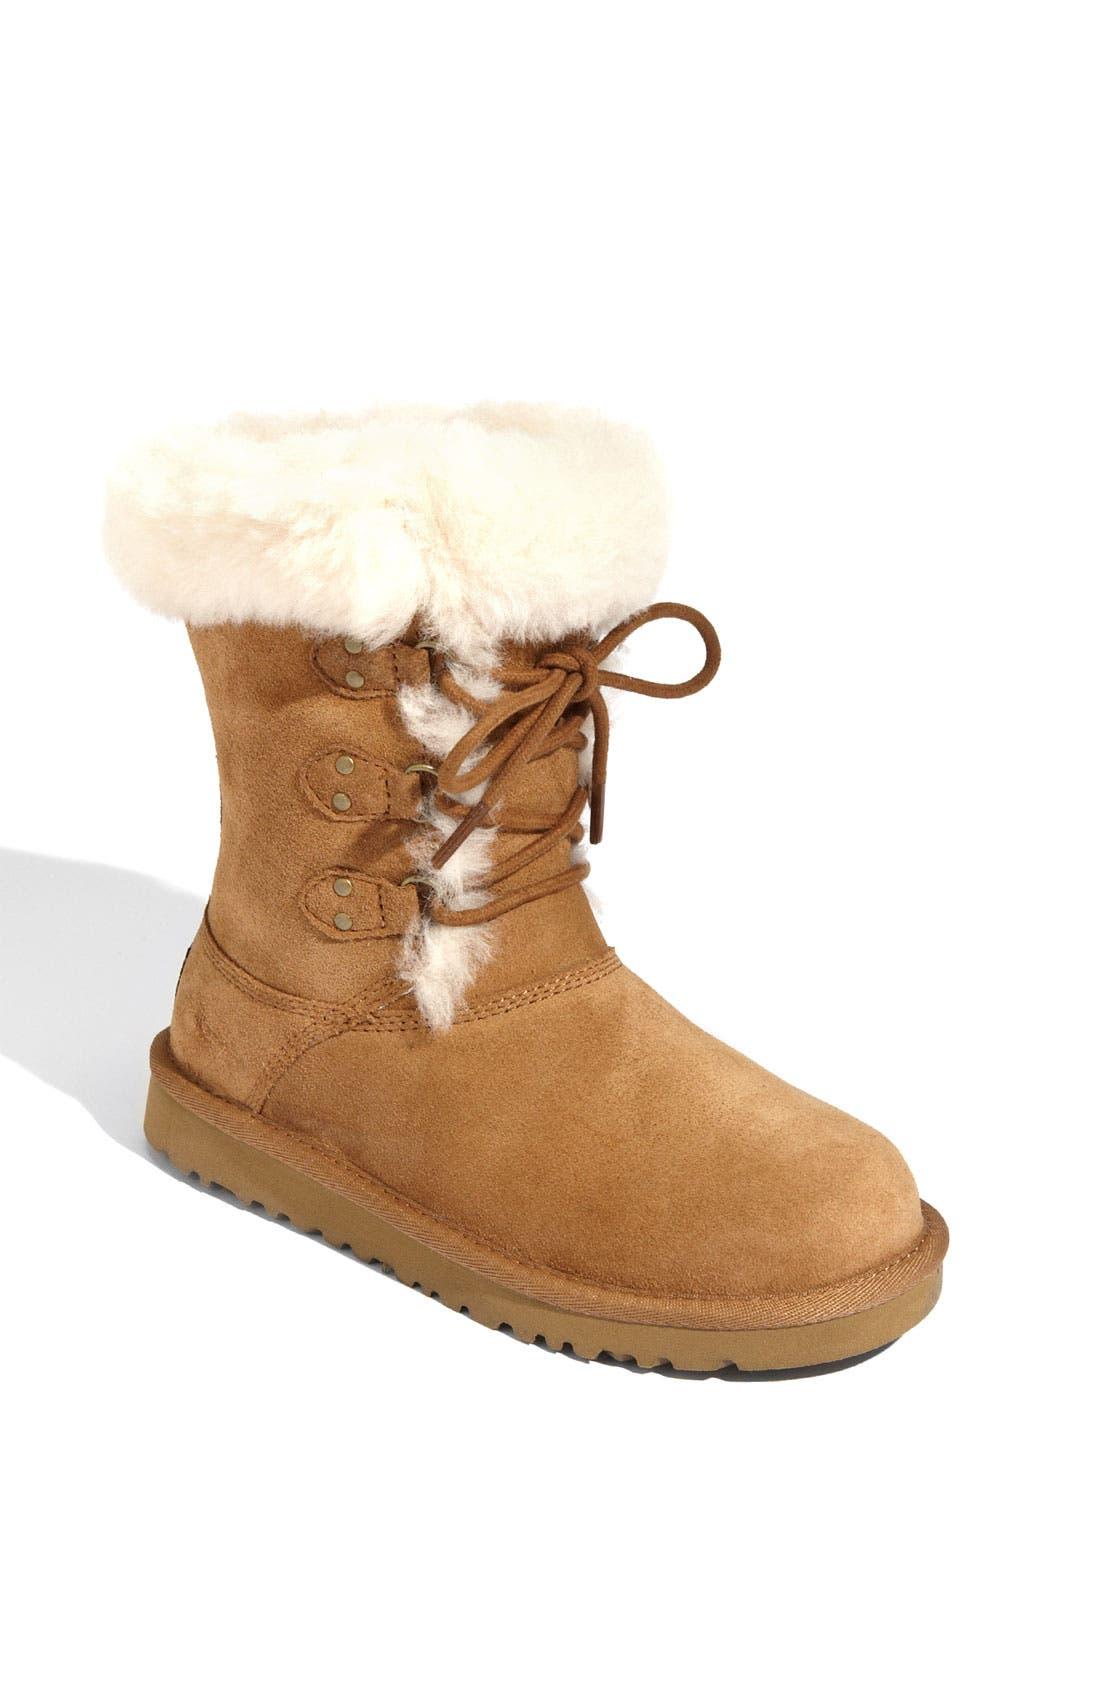 Main Image - UGG® Australia 'Sophy' Boot (Toddler, Little Kid & Big Kid)